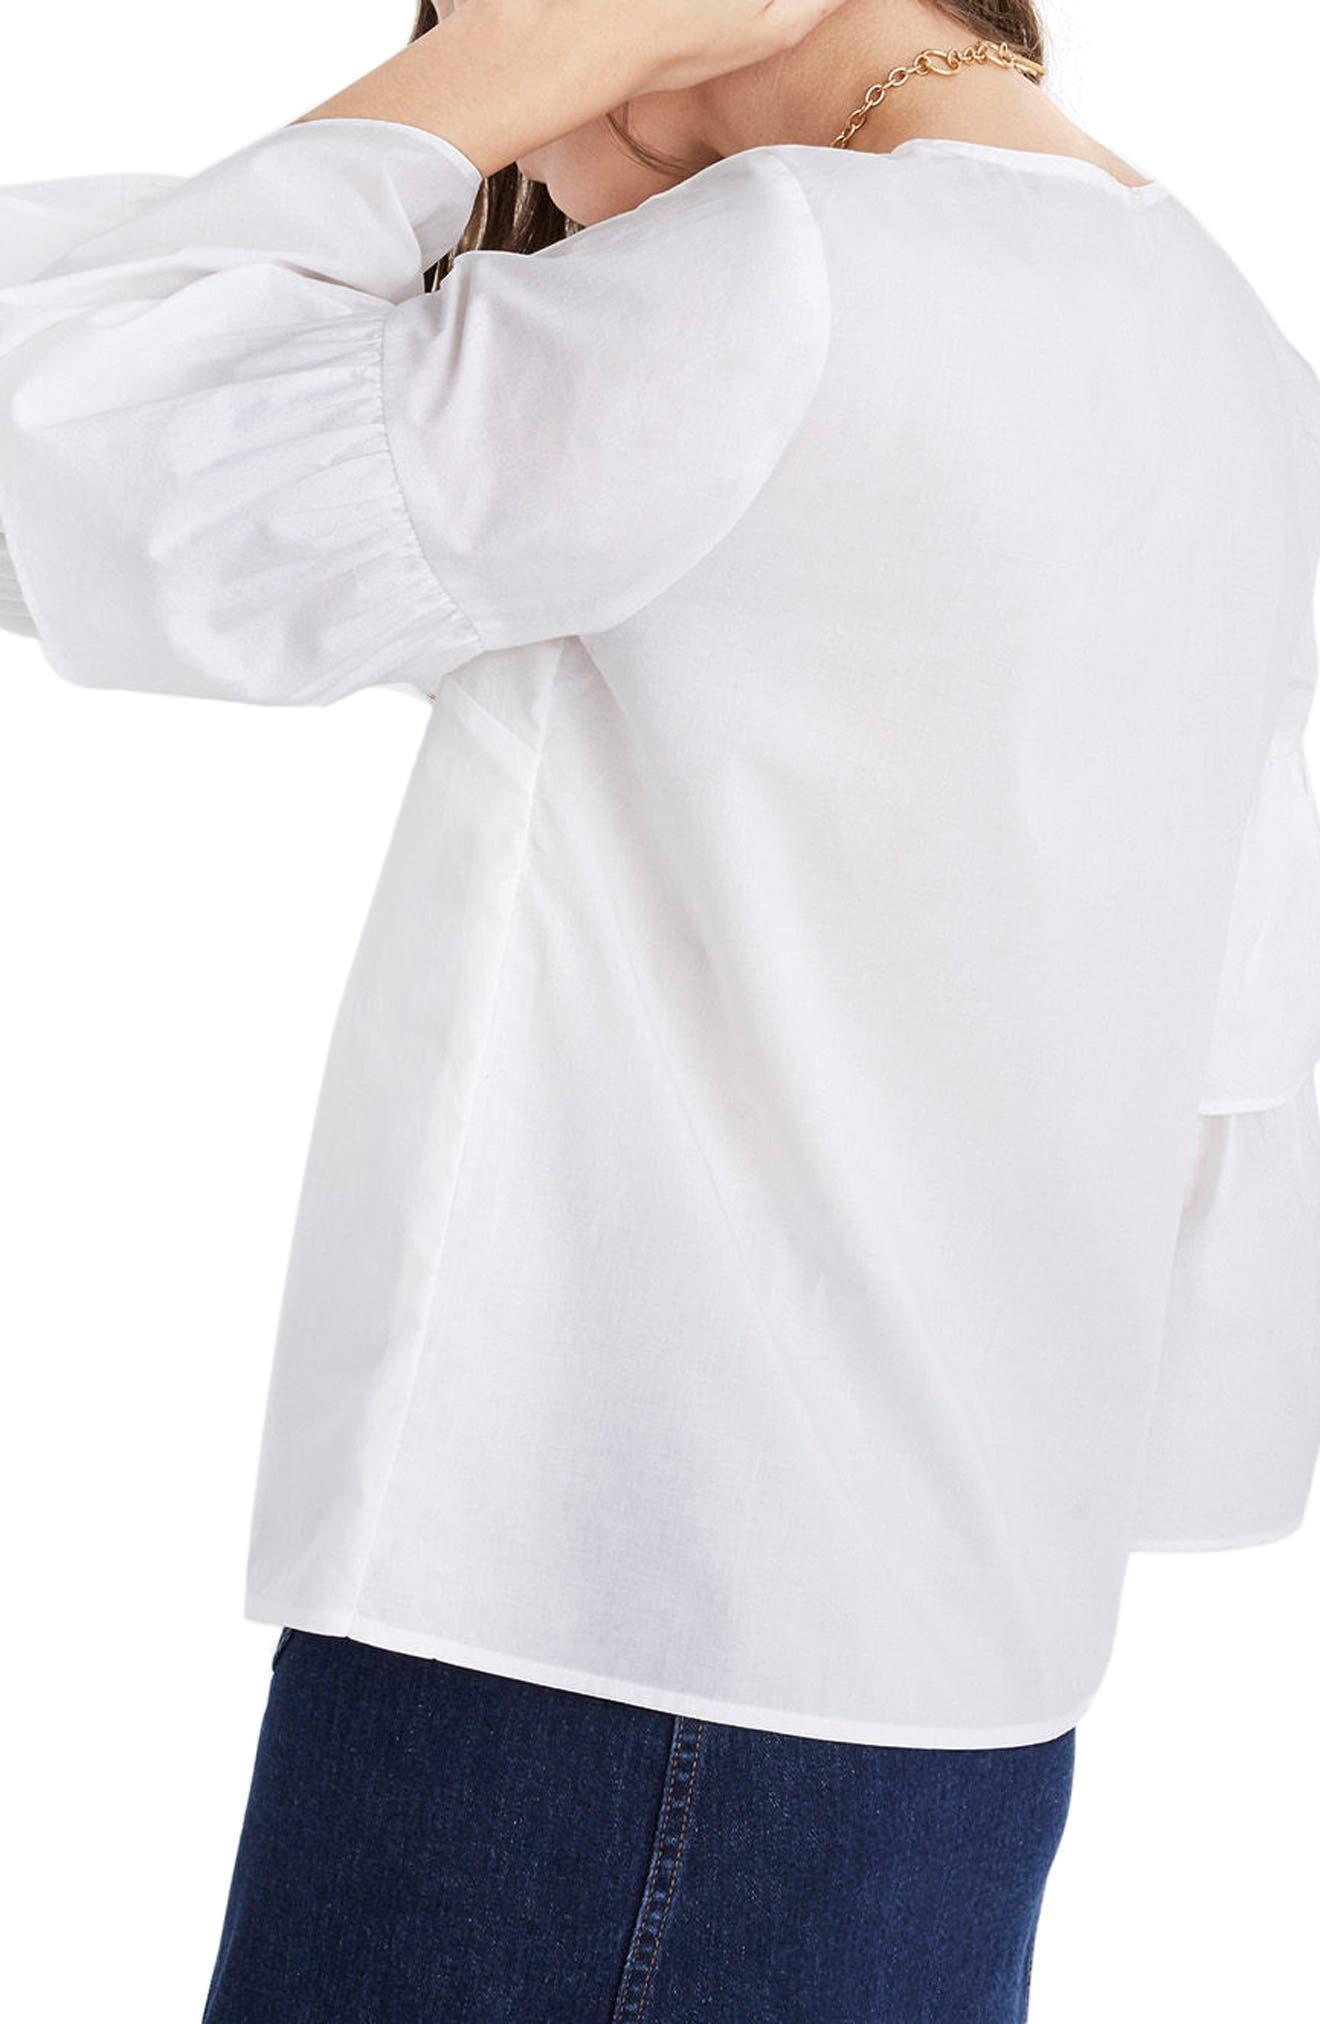 Tiered Sleeve Poplin Top,                             Alternate thumbnail 3, color,                             100